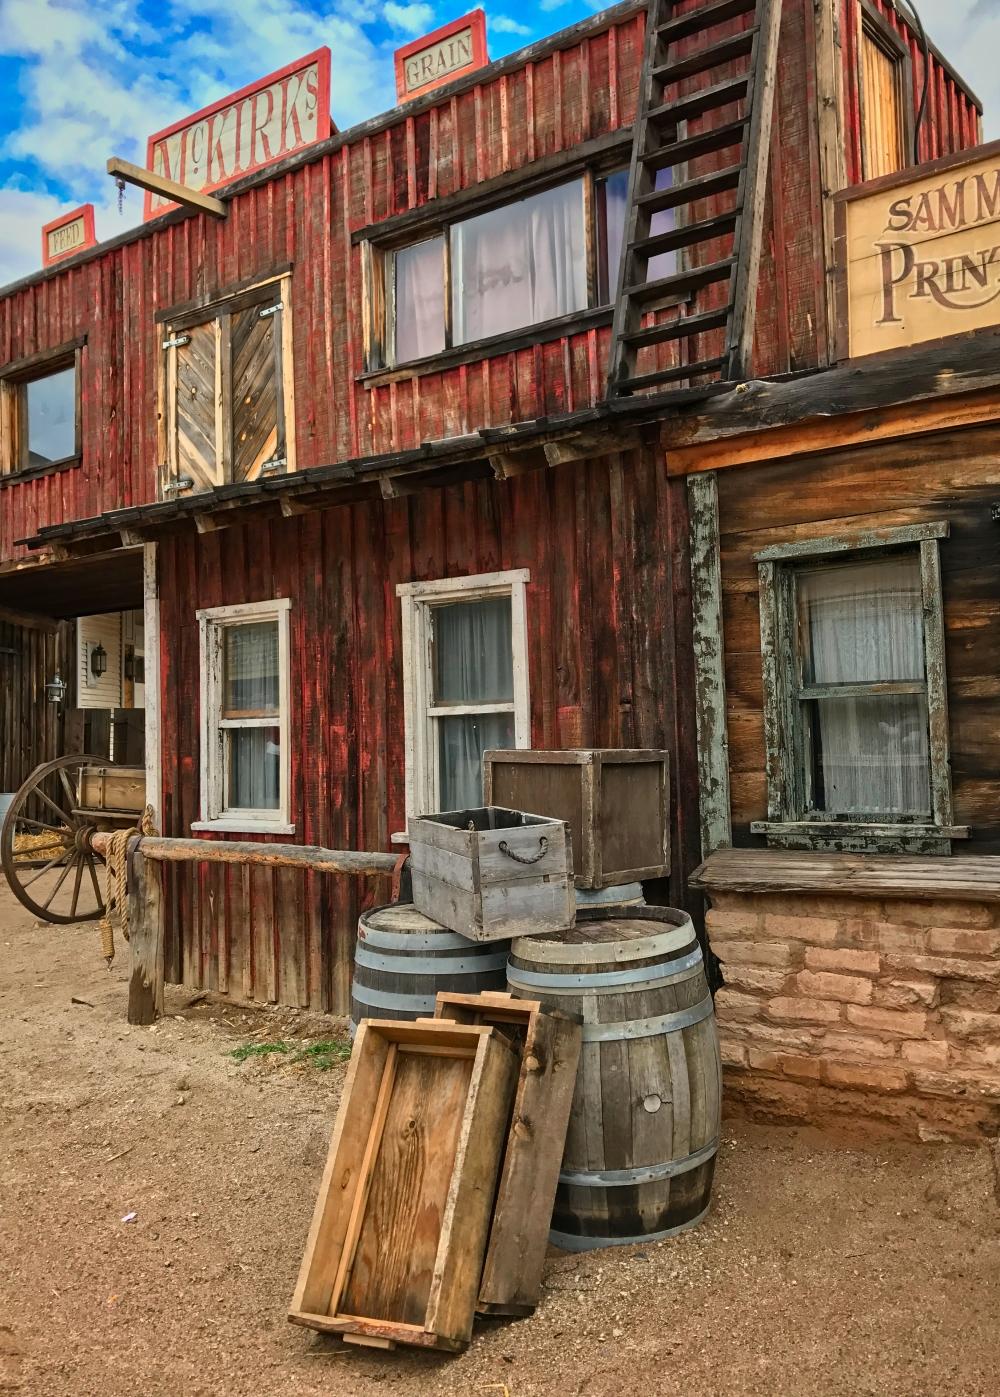 Old Tucson barrels